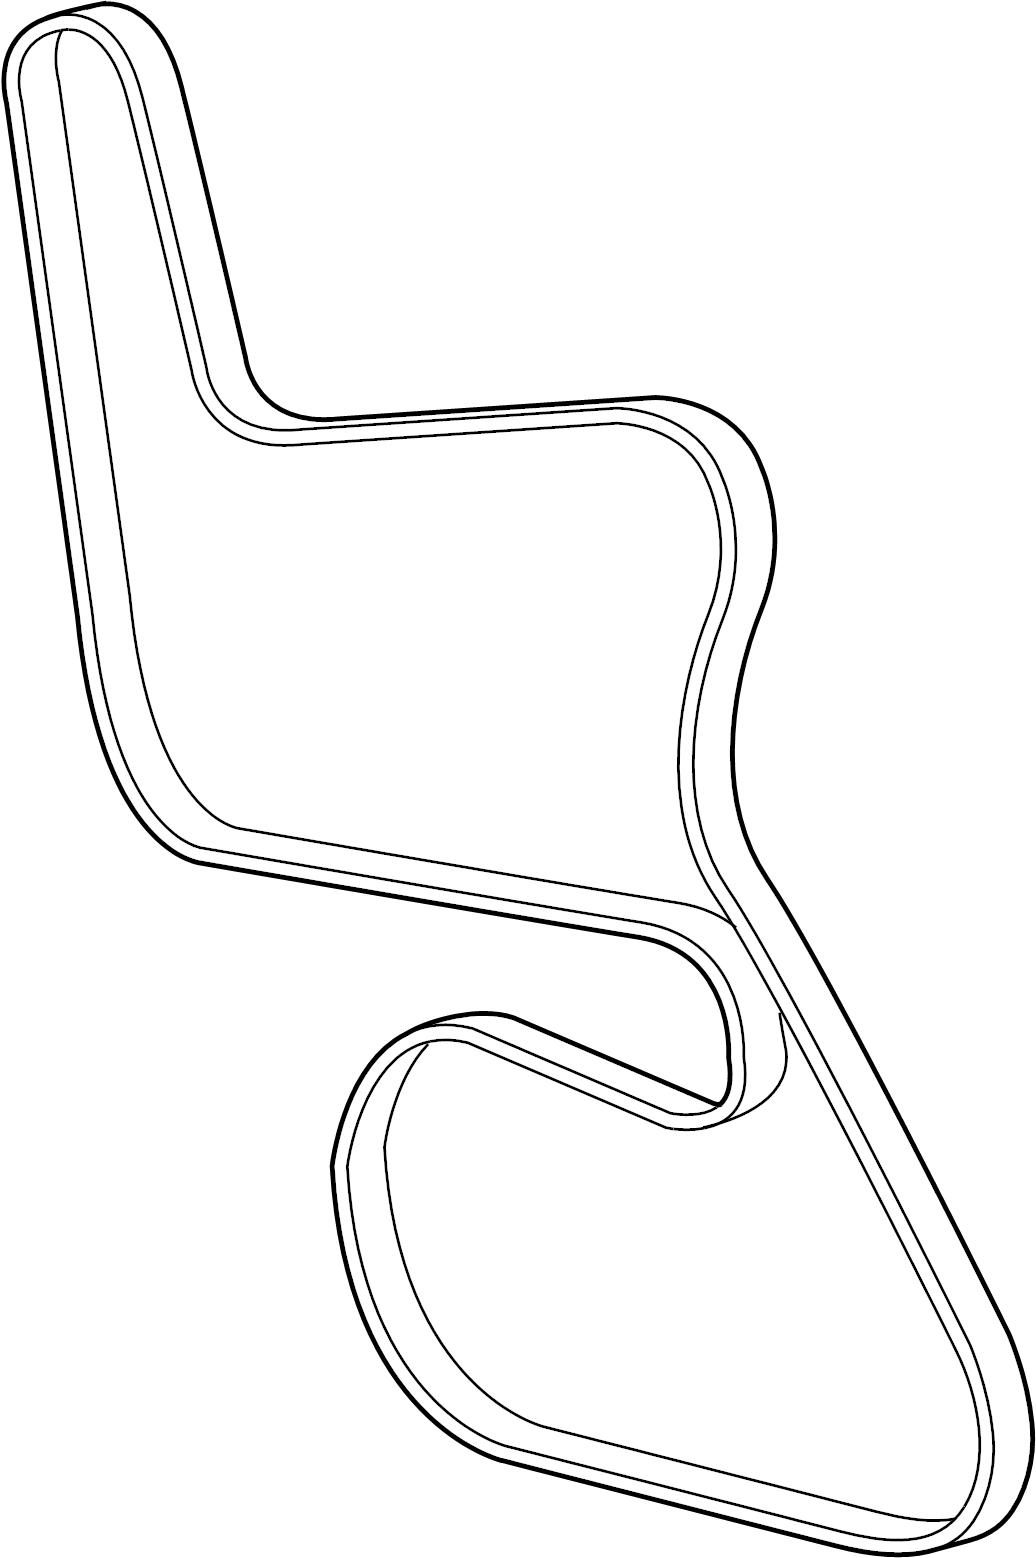 Buick Terraza Serpentine Belt